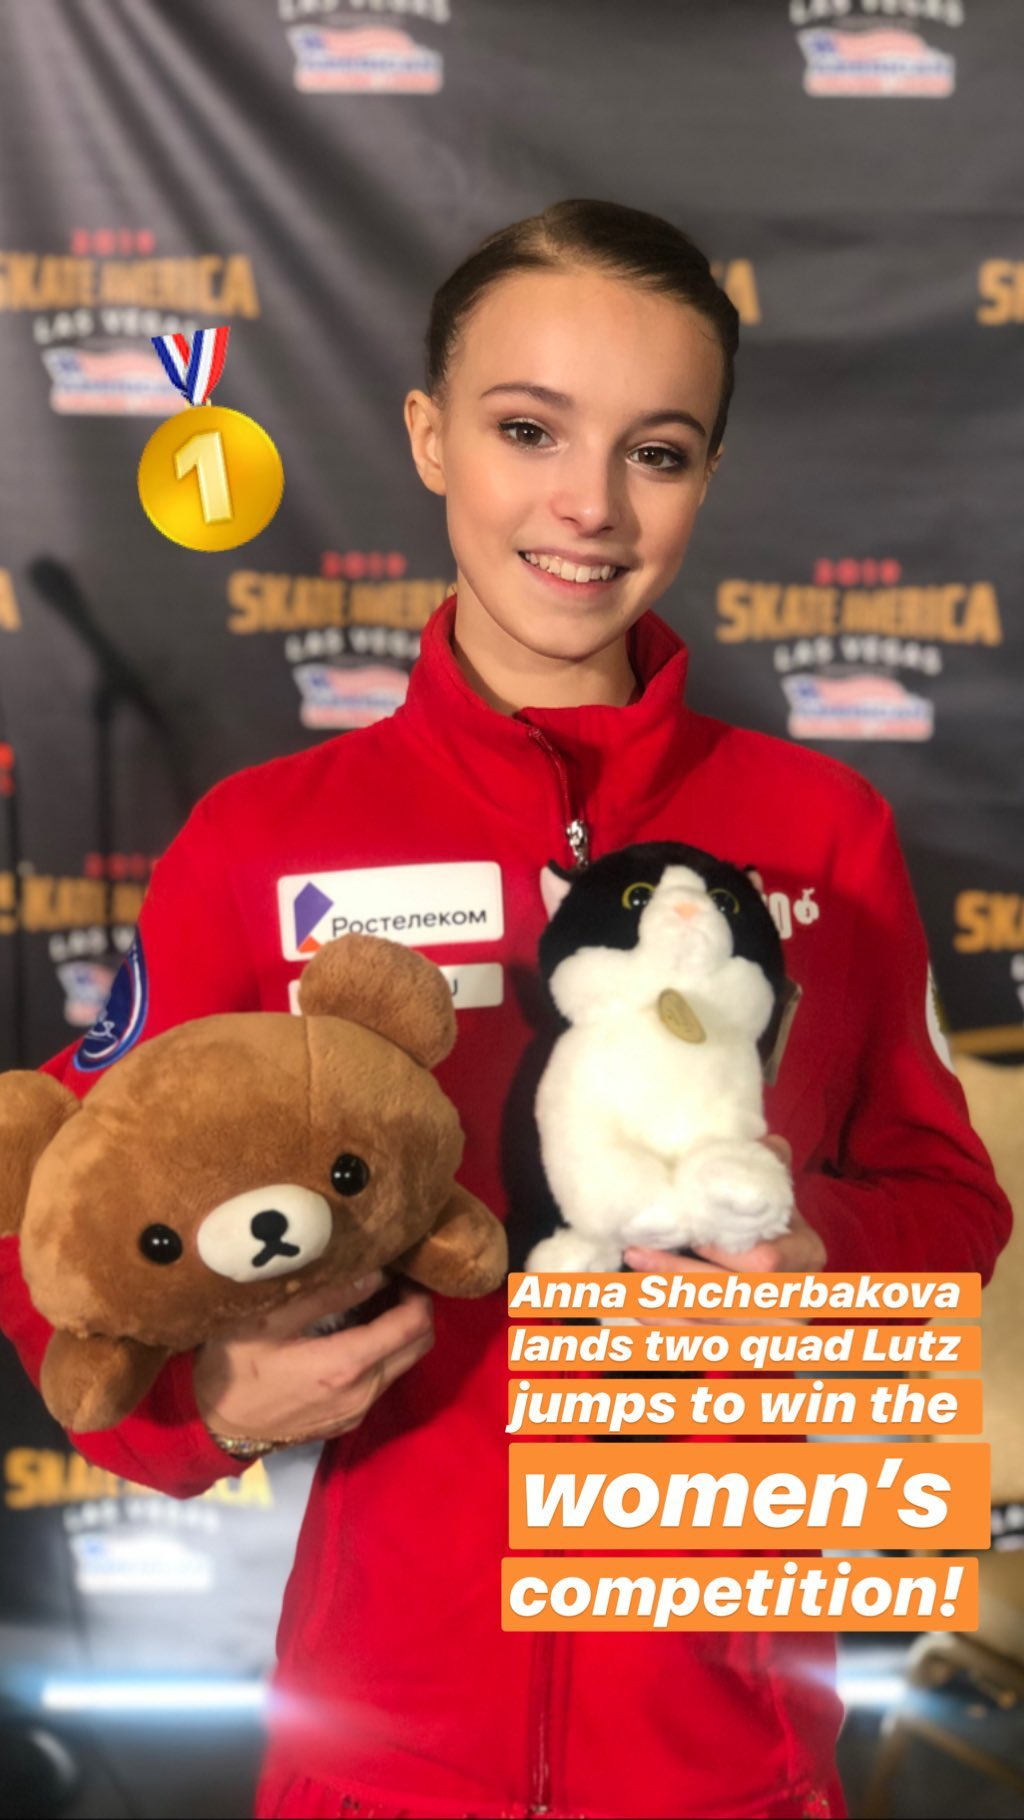 GP - 1 этап. Skate America Las Vegas, NV / USA October 18-20, 2019   - Страница 20 Gojv3lXmKdA